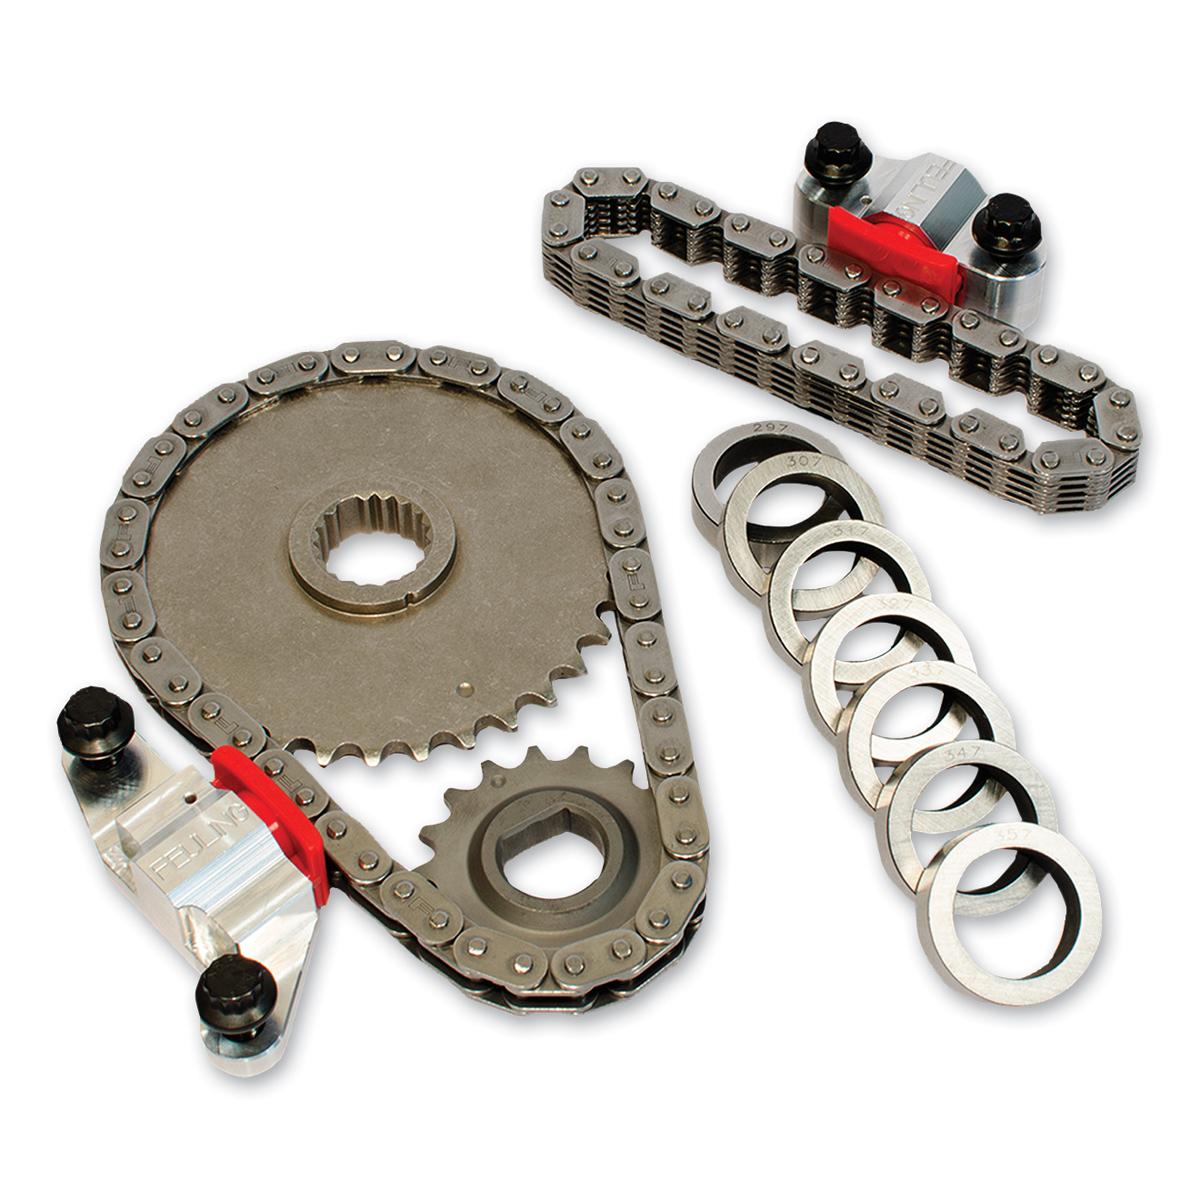 Feuling Hydraulic Cam Chain Conversion Kits